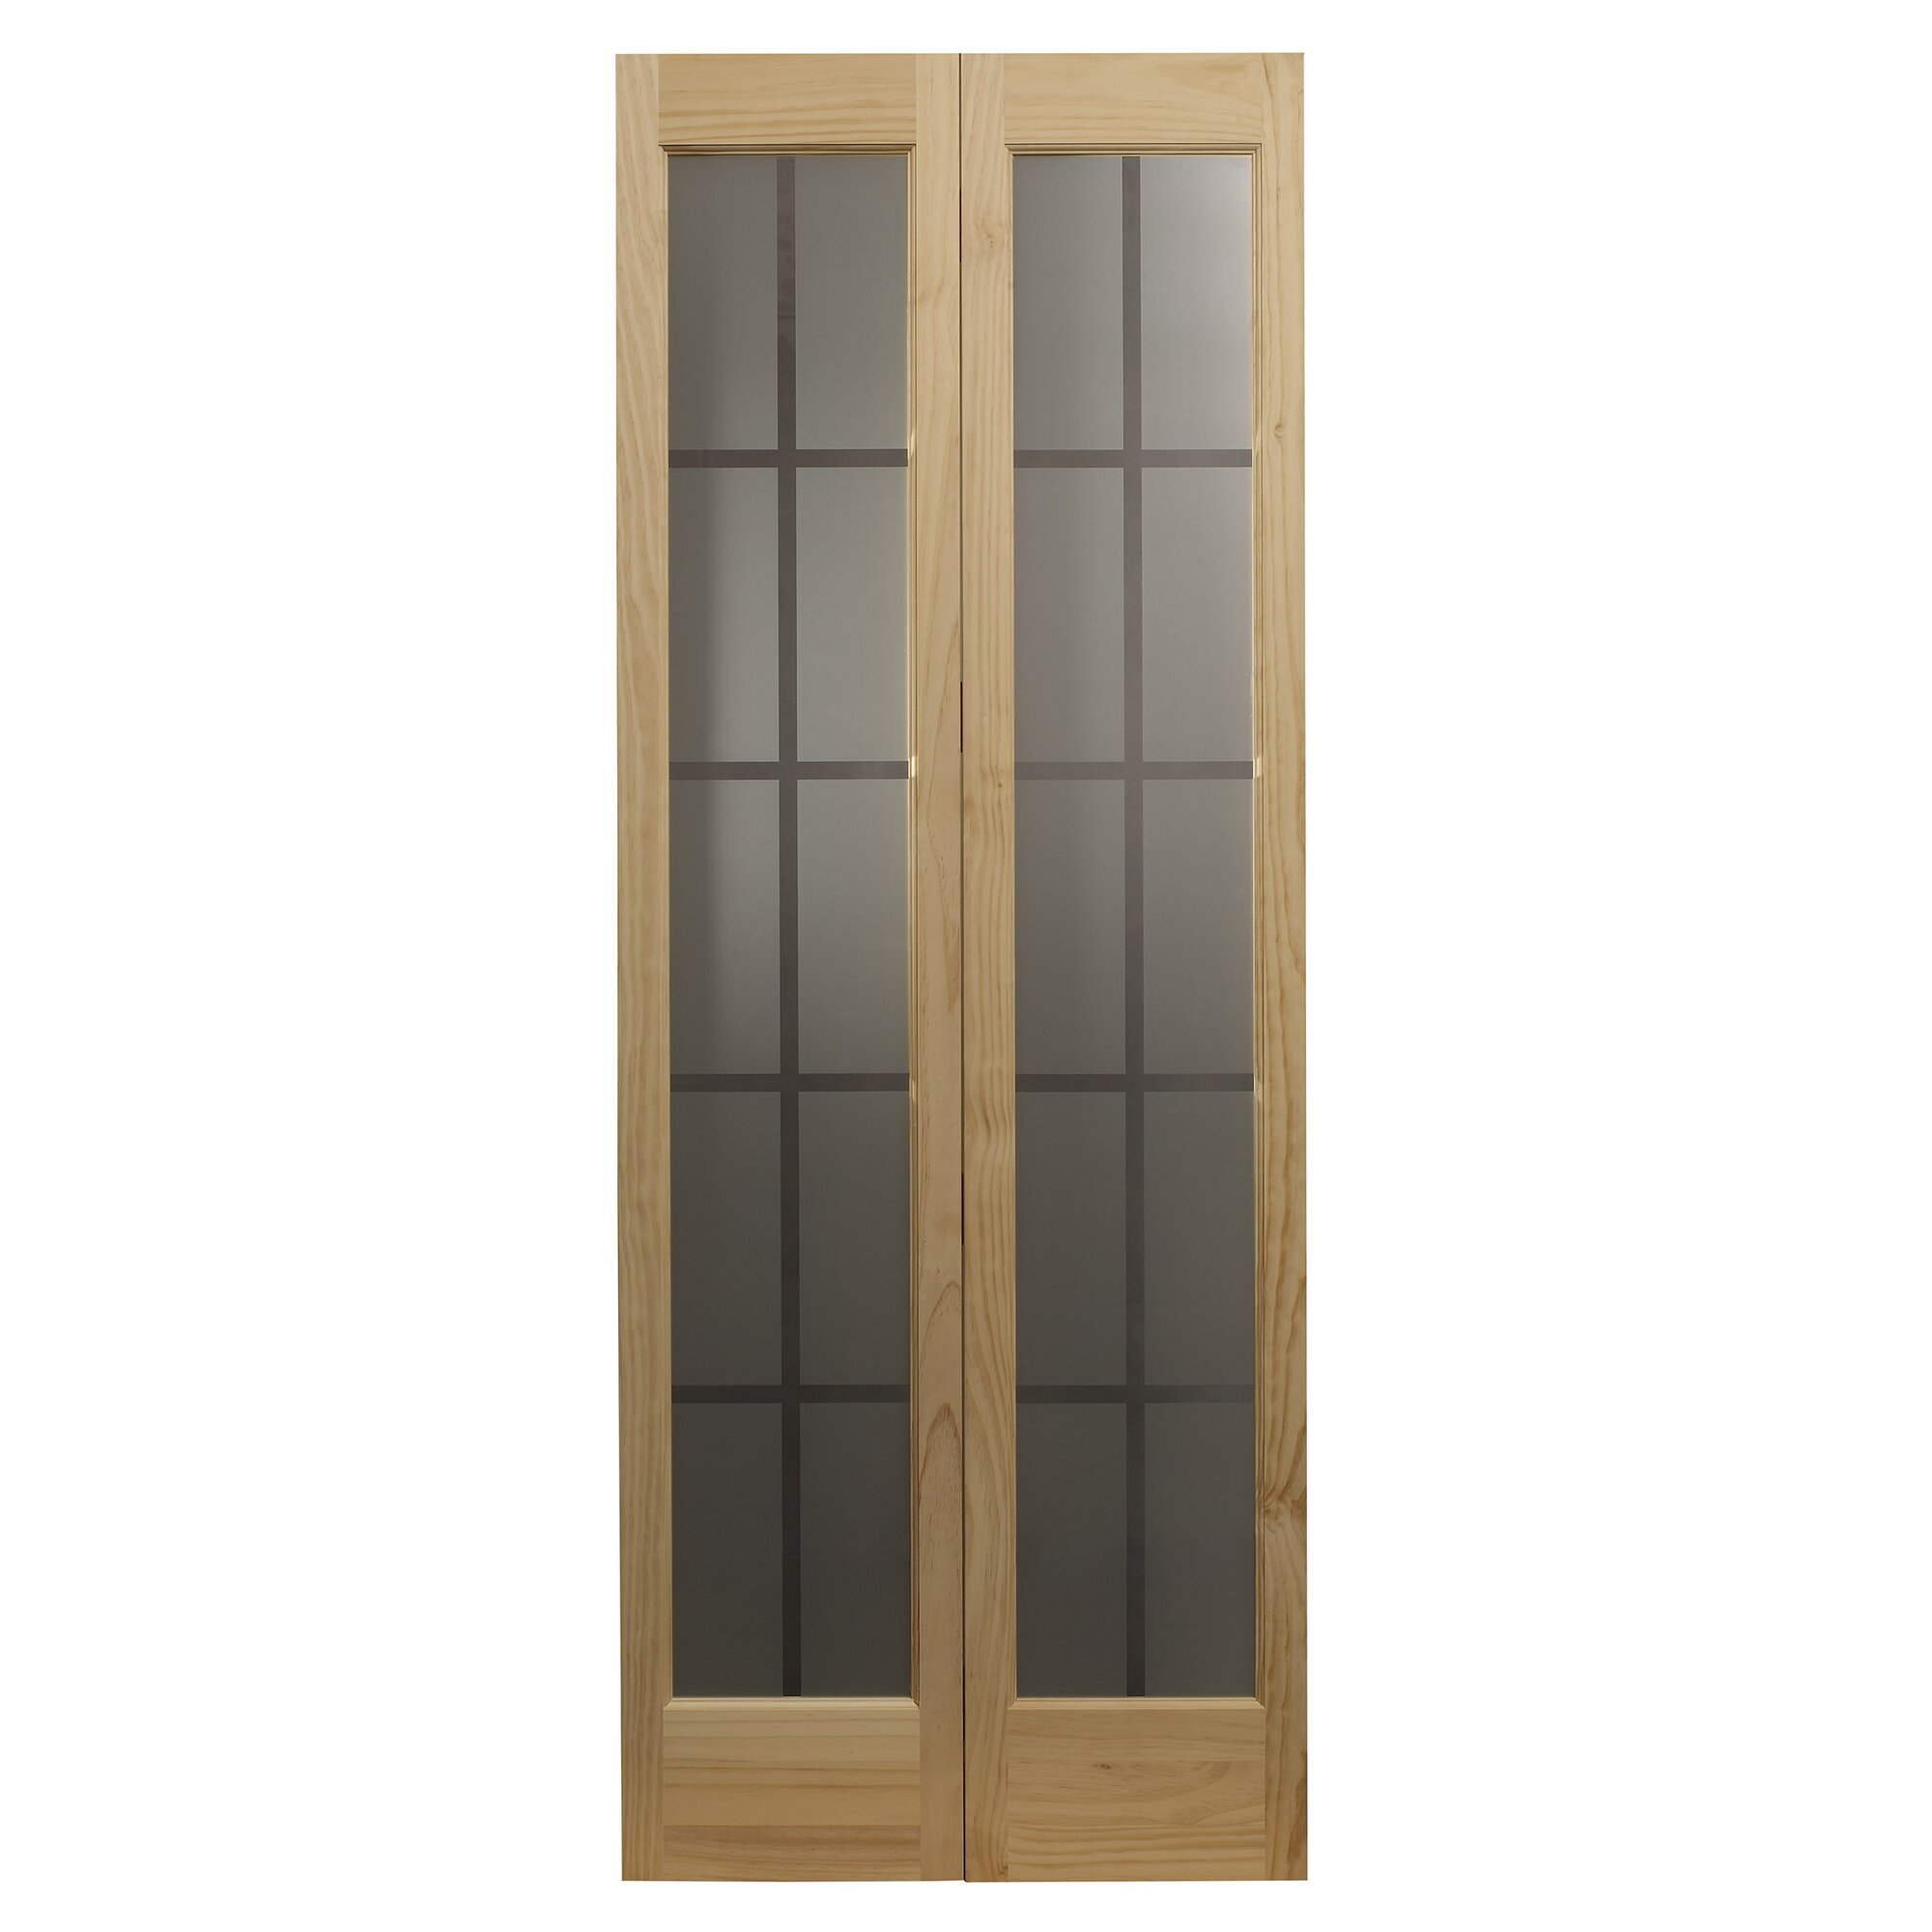 Interior glass bifold doors - Bi Fold Interior Door Magnifying Glass